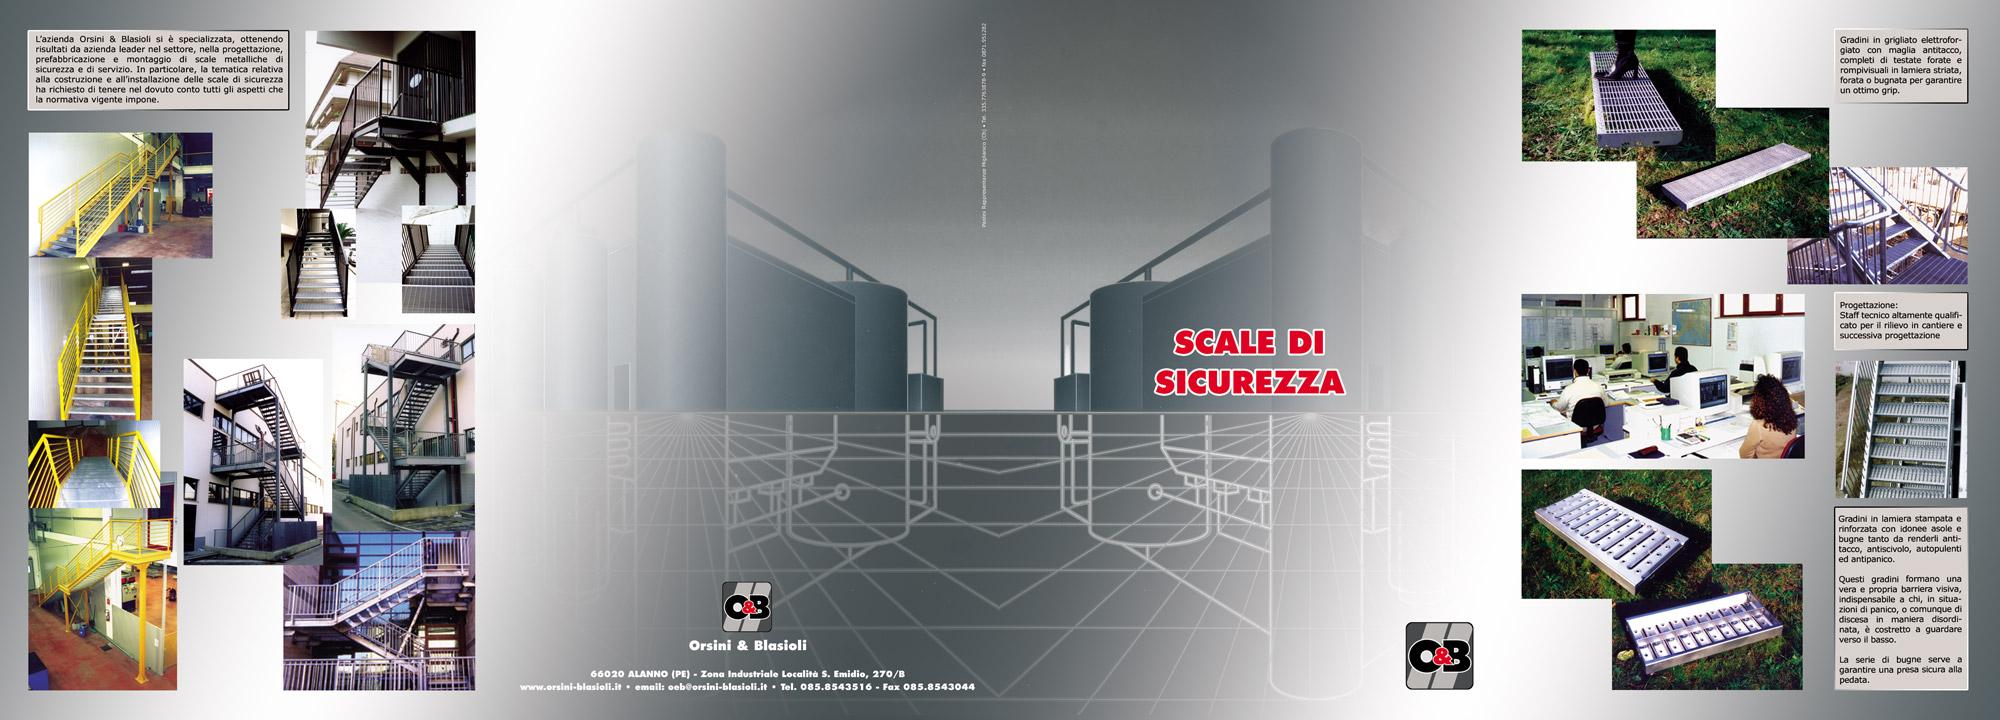 scale Orsini&Blasioli